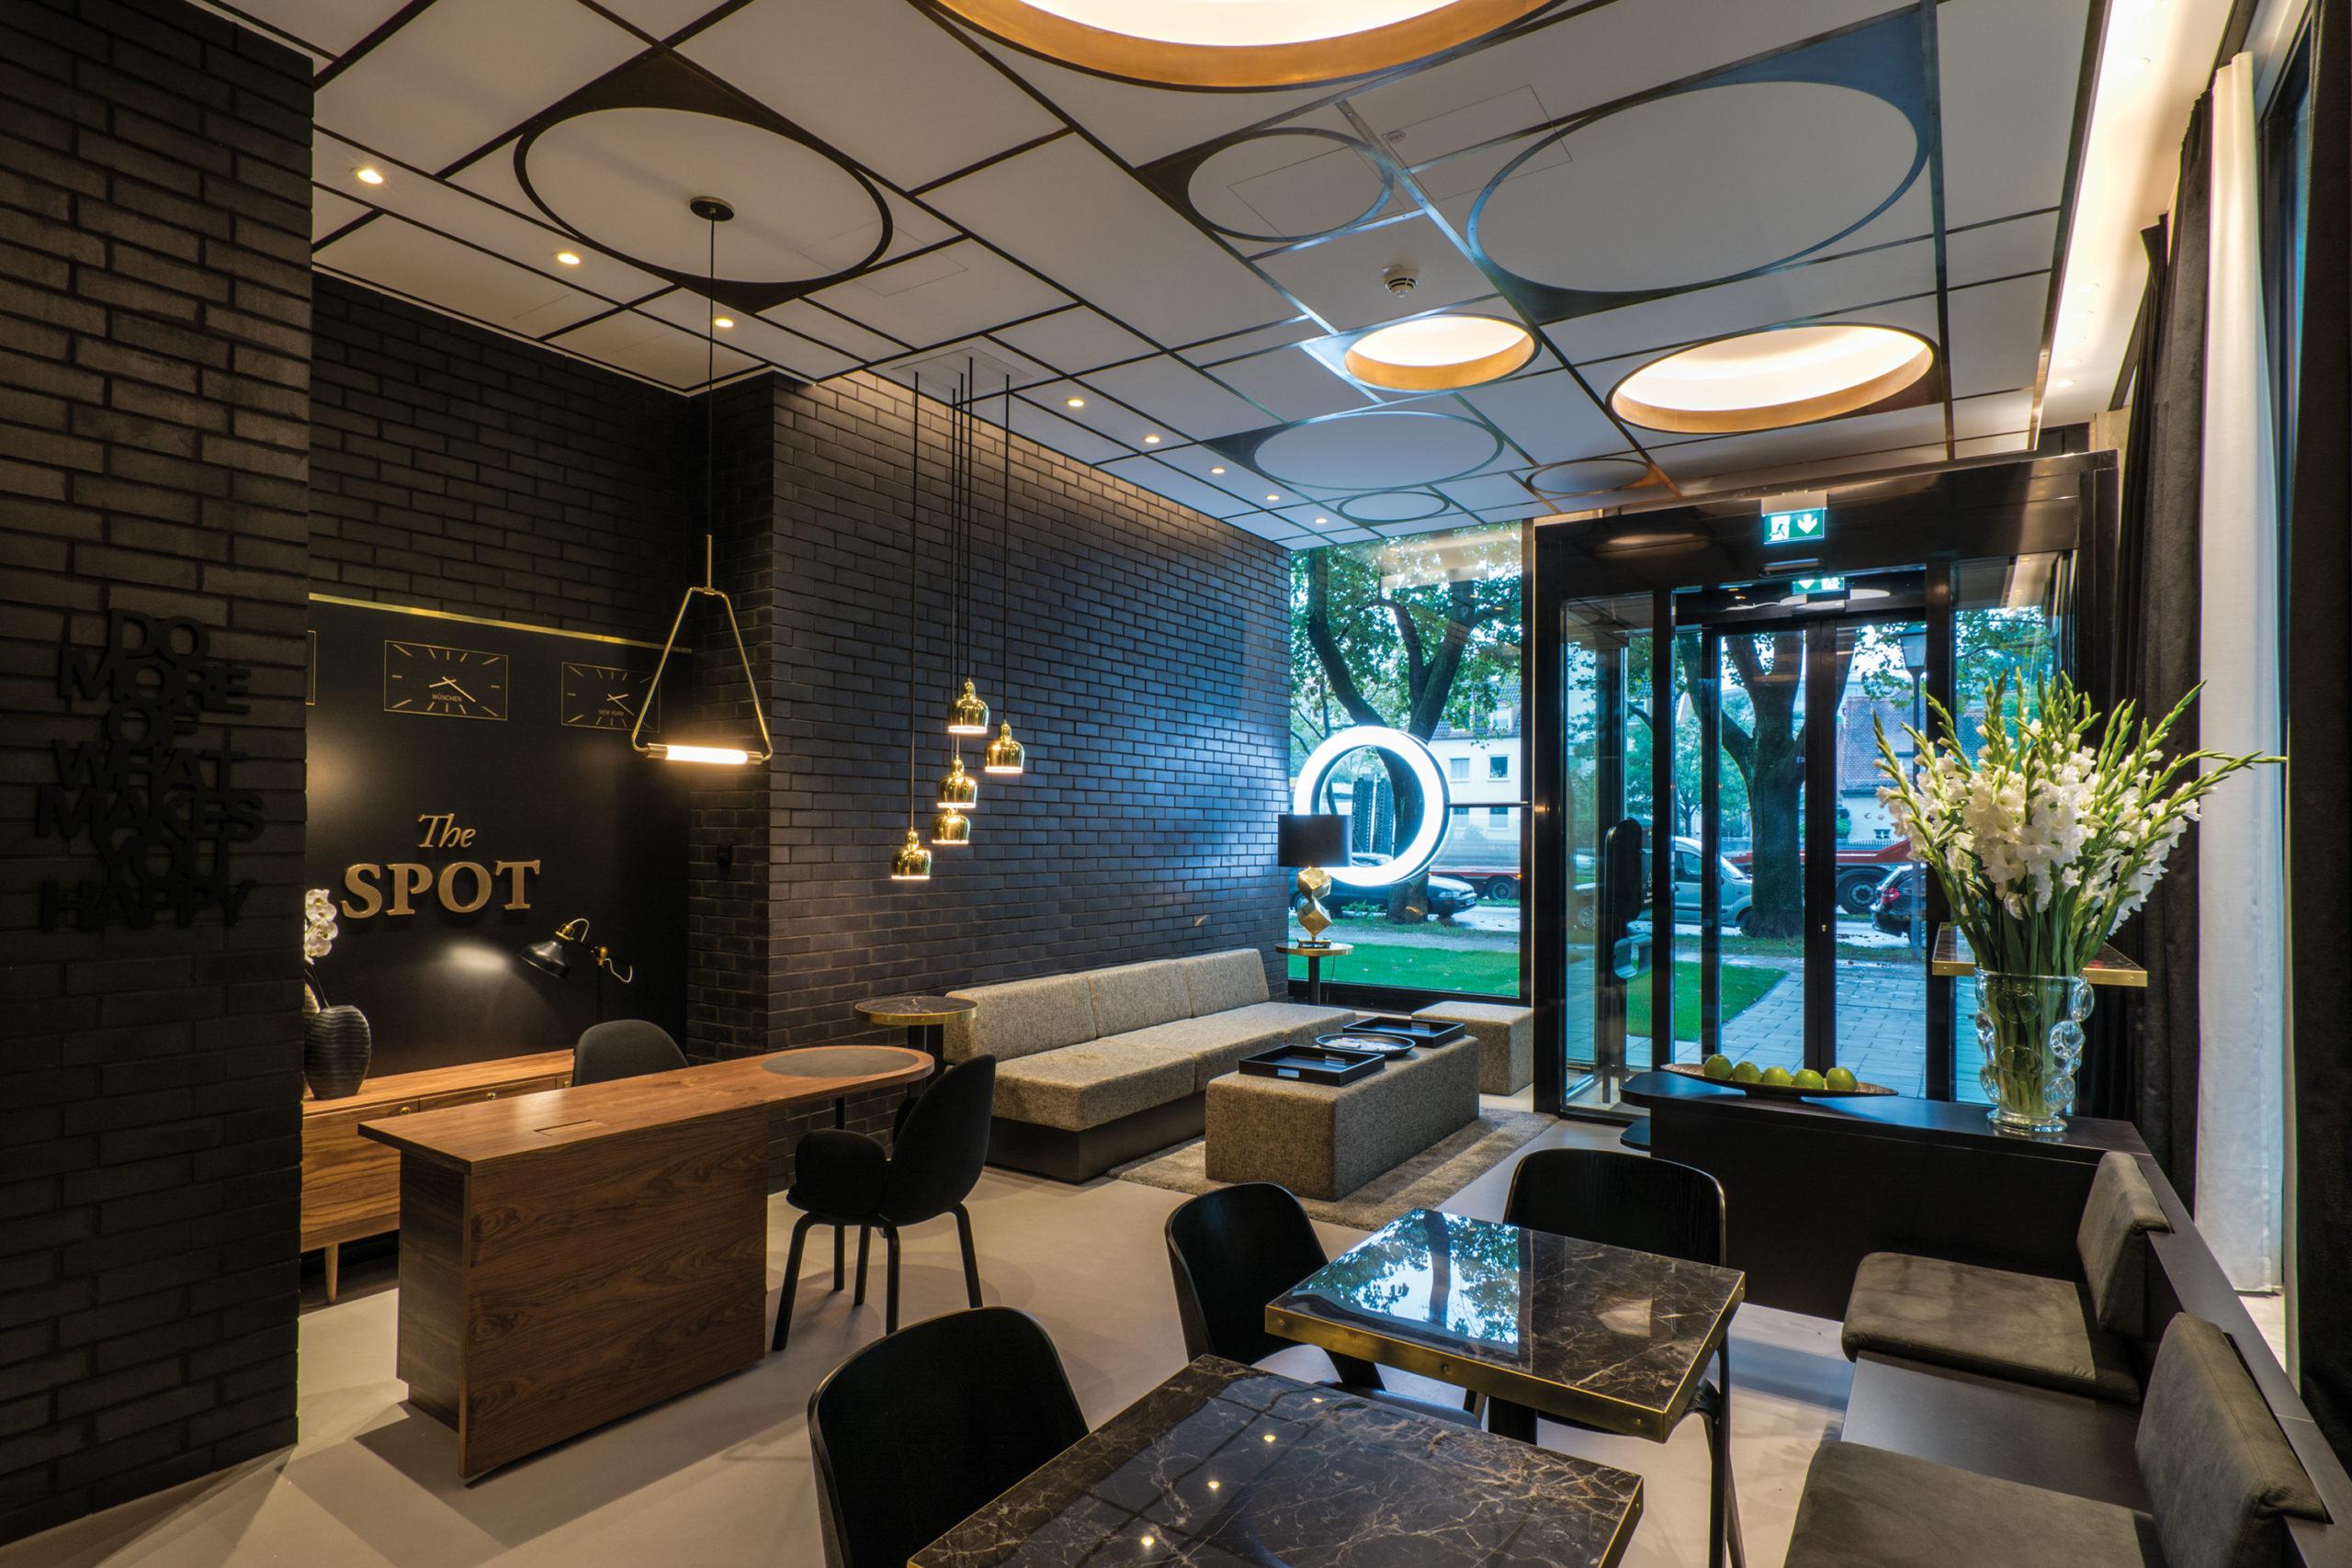 THE SPOT / Serviced Apartments / Typographie im Raum